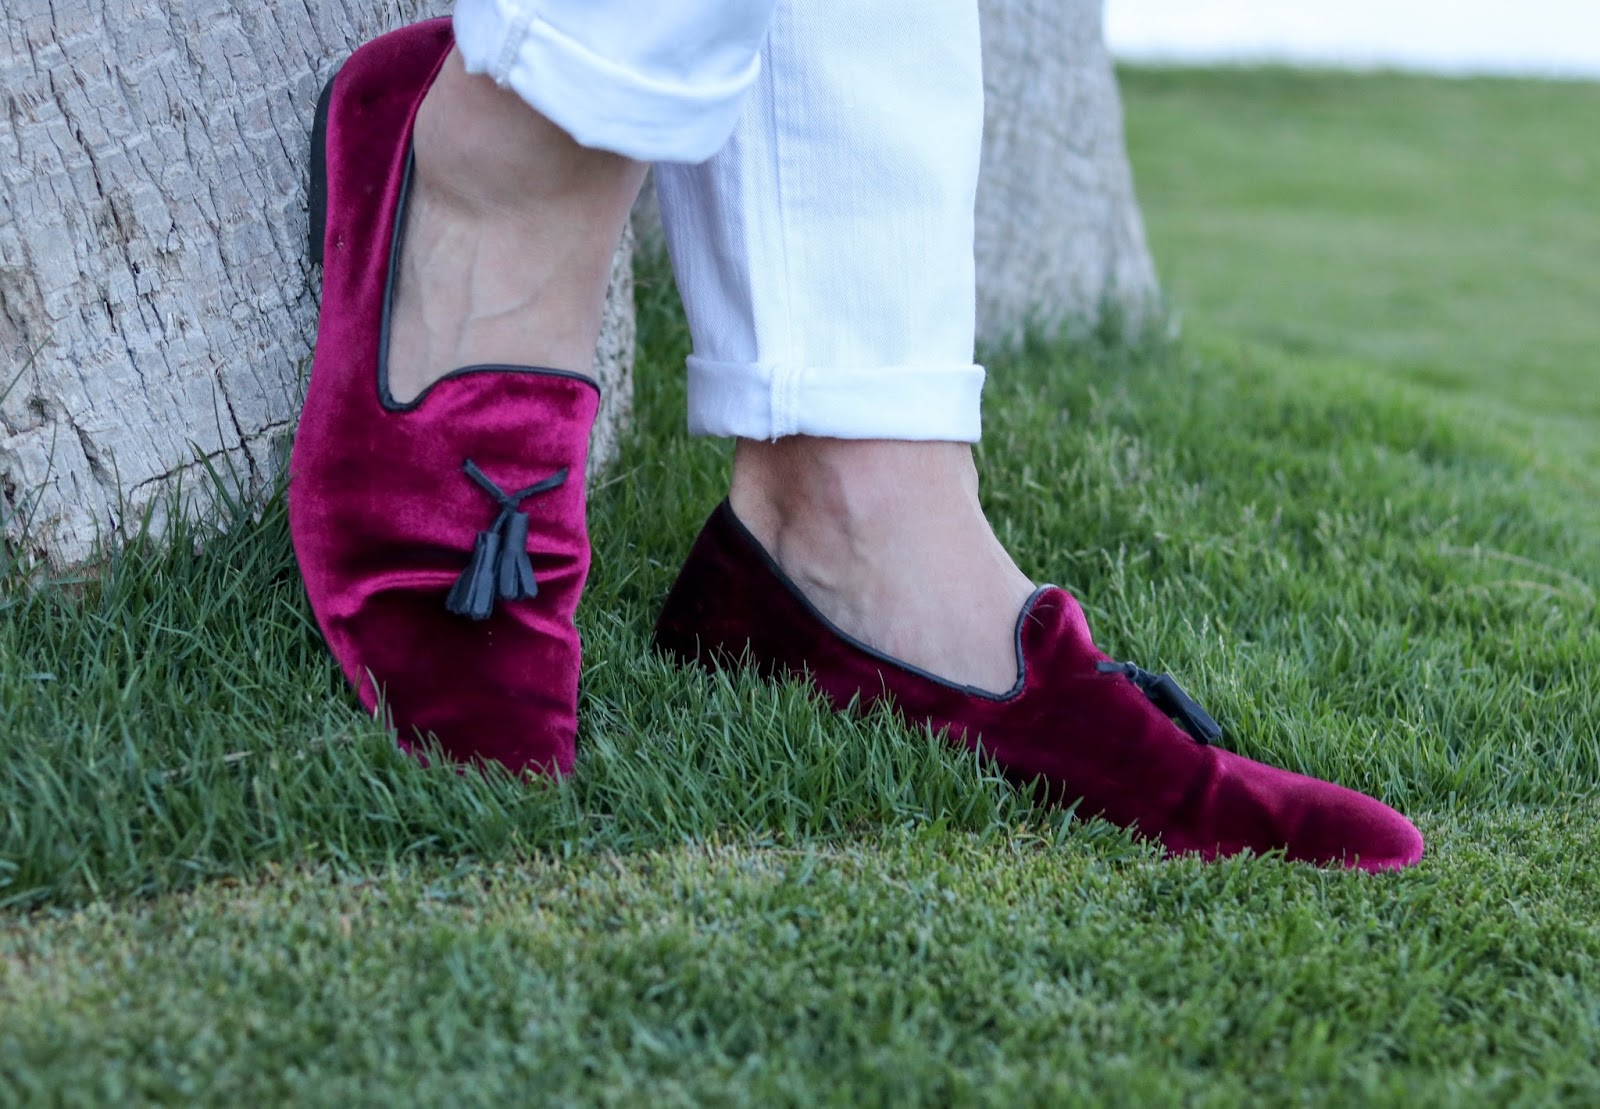 ASOS Shoes Sotogrande Spain